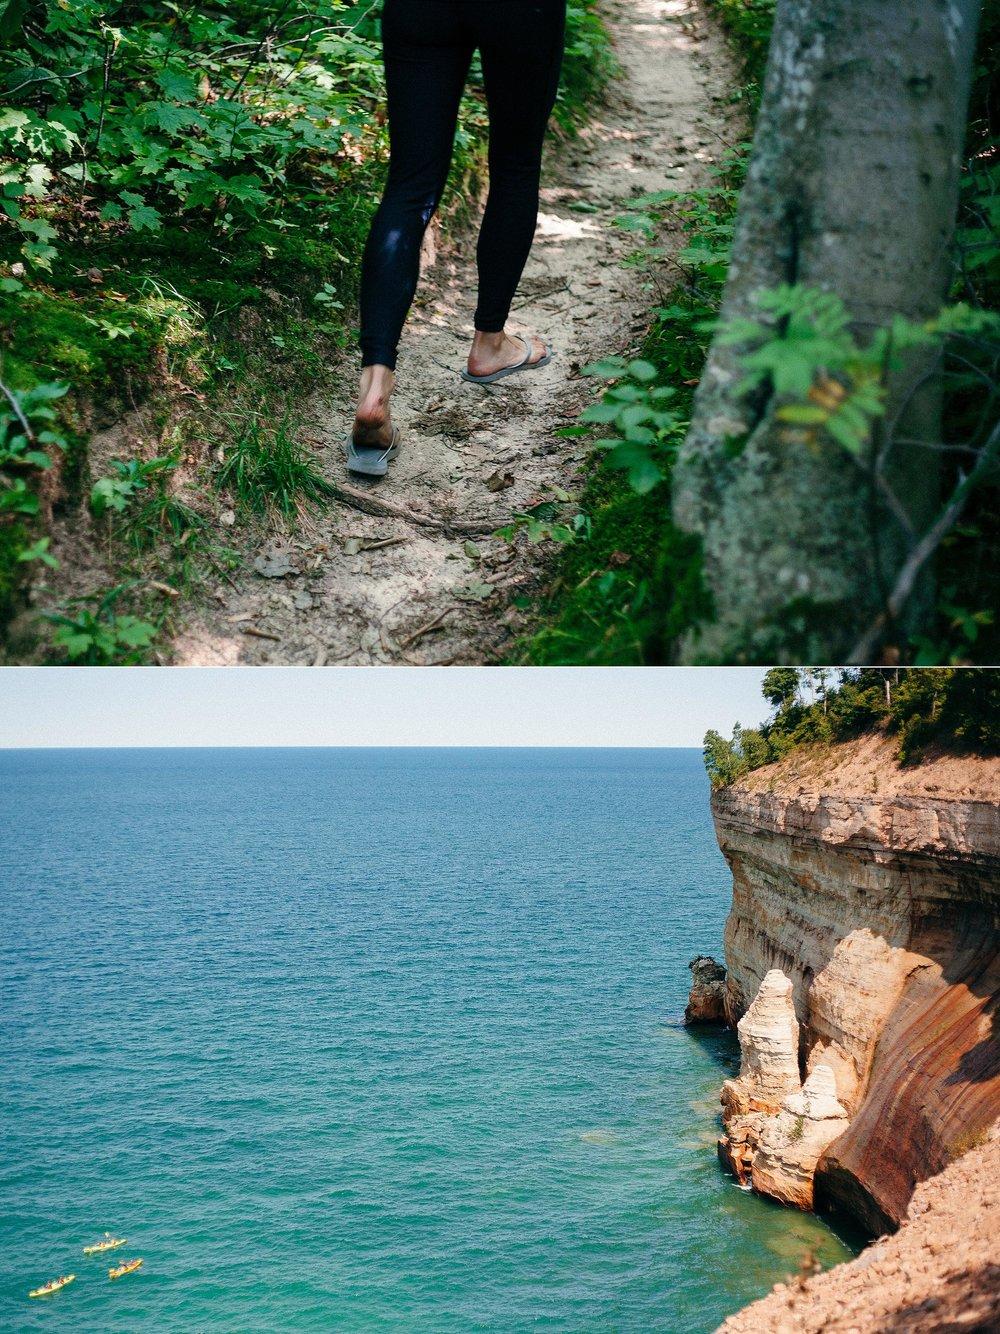 backpacking-michigan-upper-peninsula-pictured-rocks-camping-lake-superior_0065.jpg